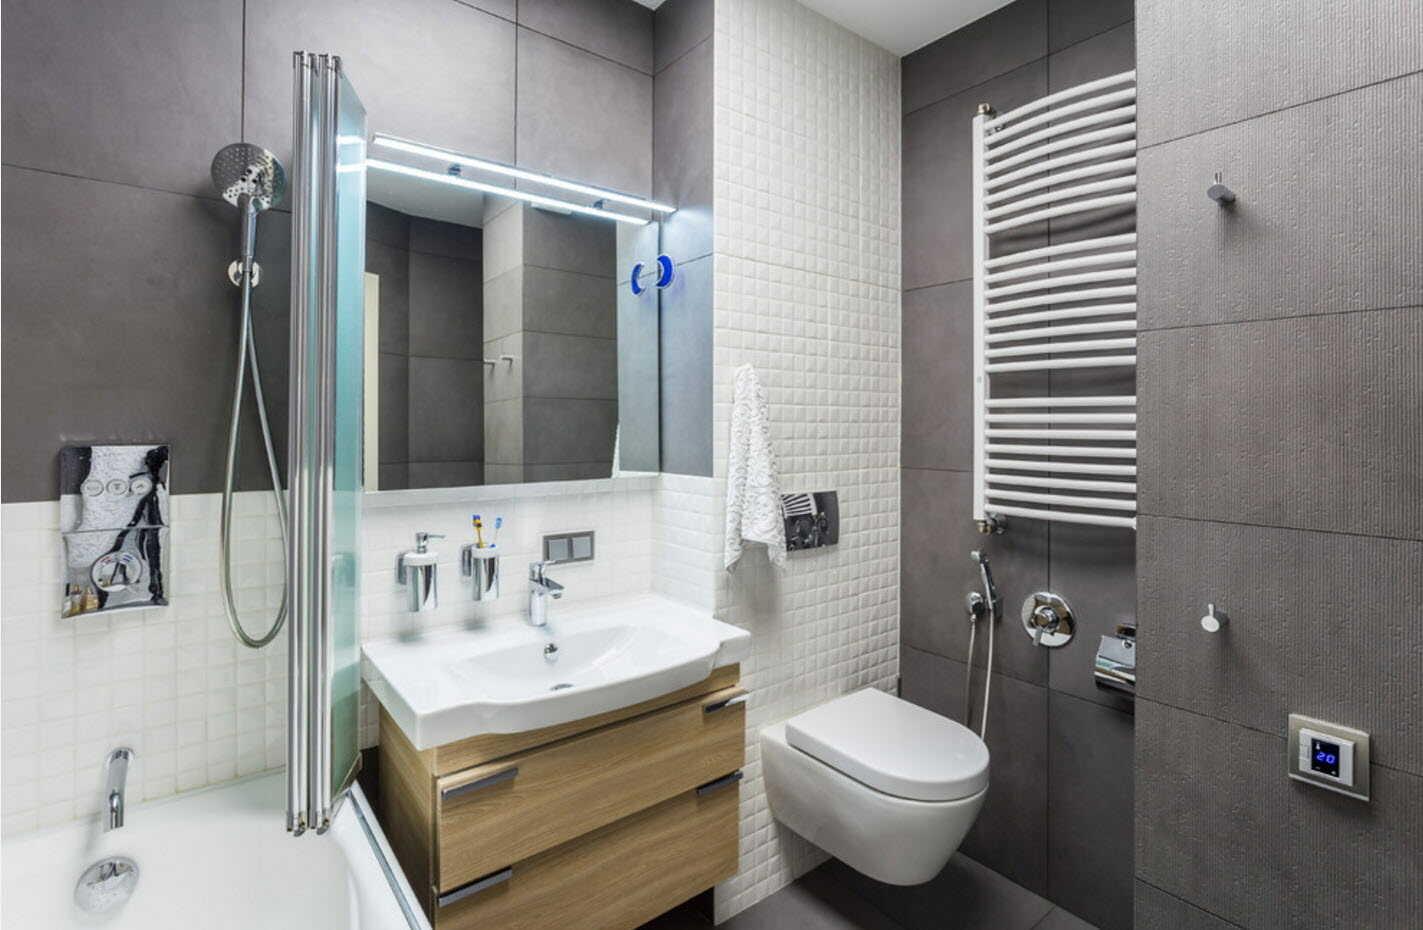 Ванная комната с раковиной